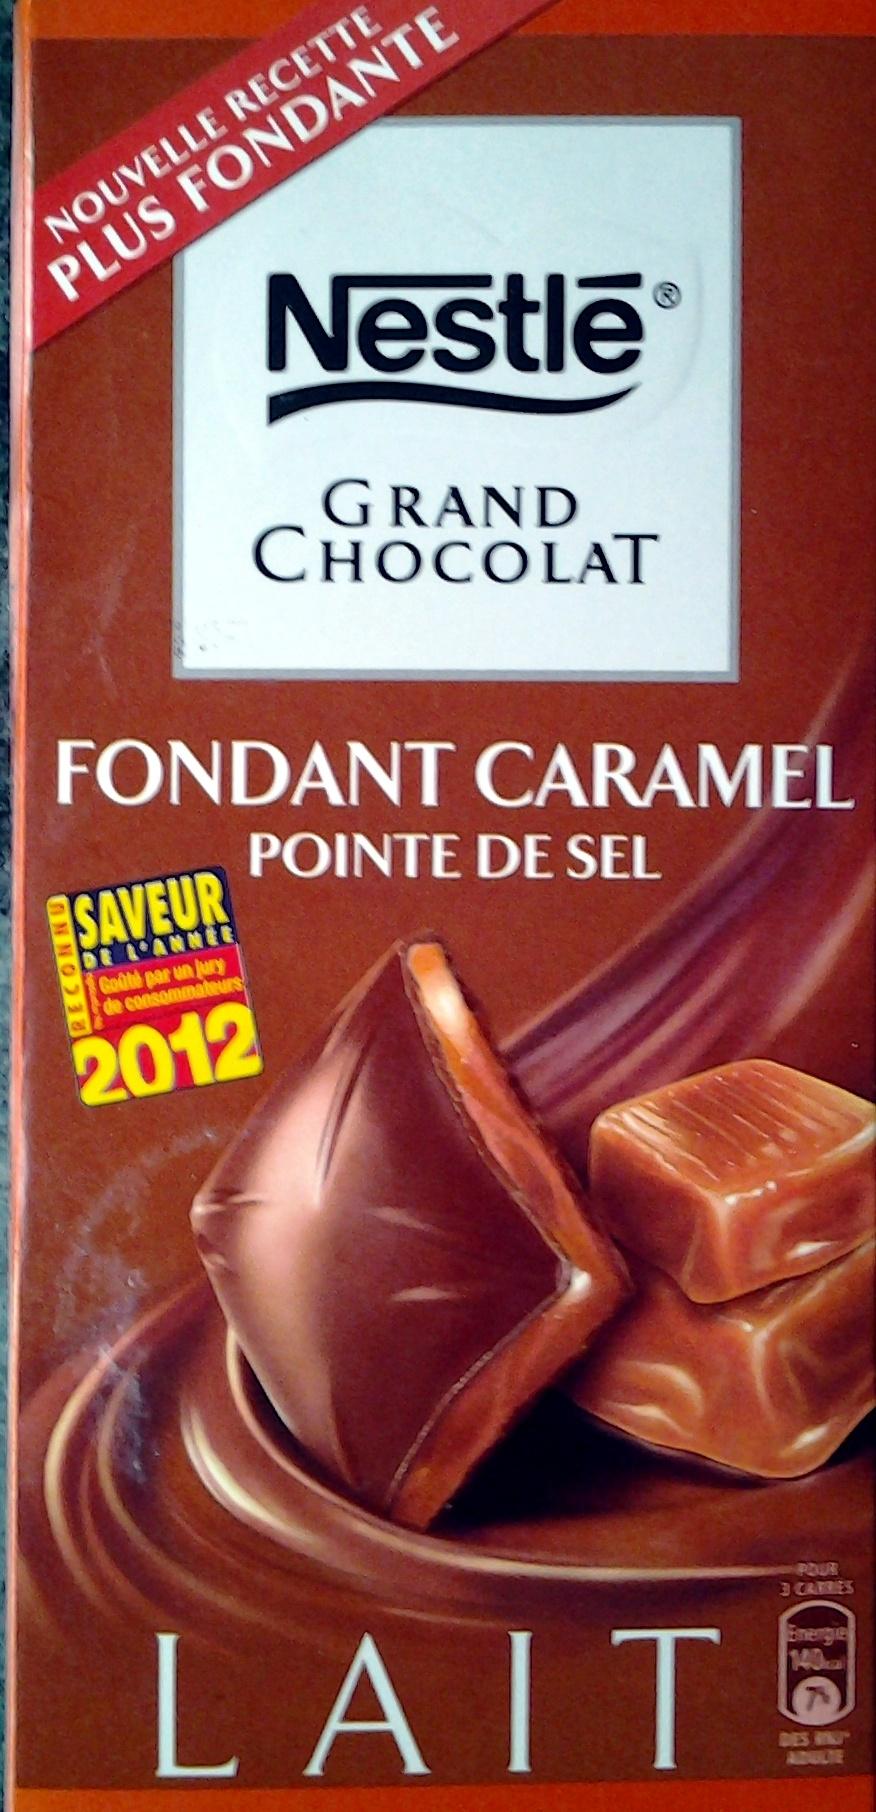 Fondant Caramel Pointe de sel - Product - fr